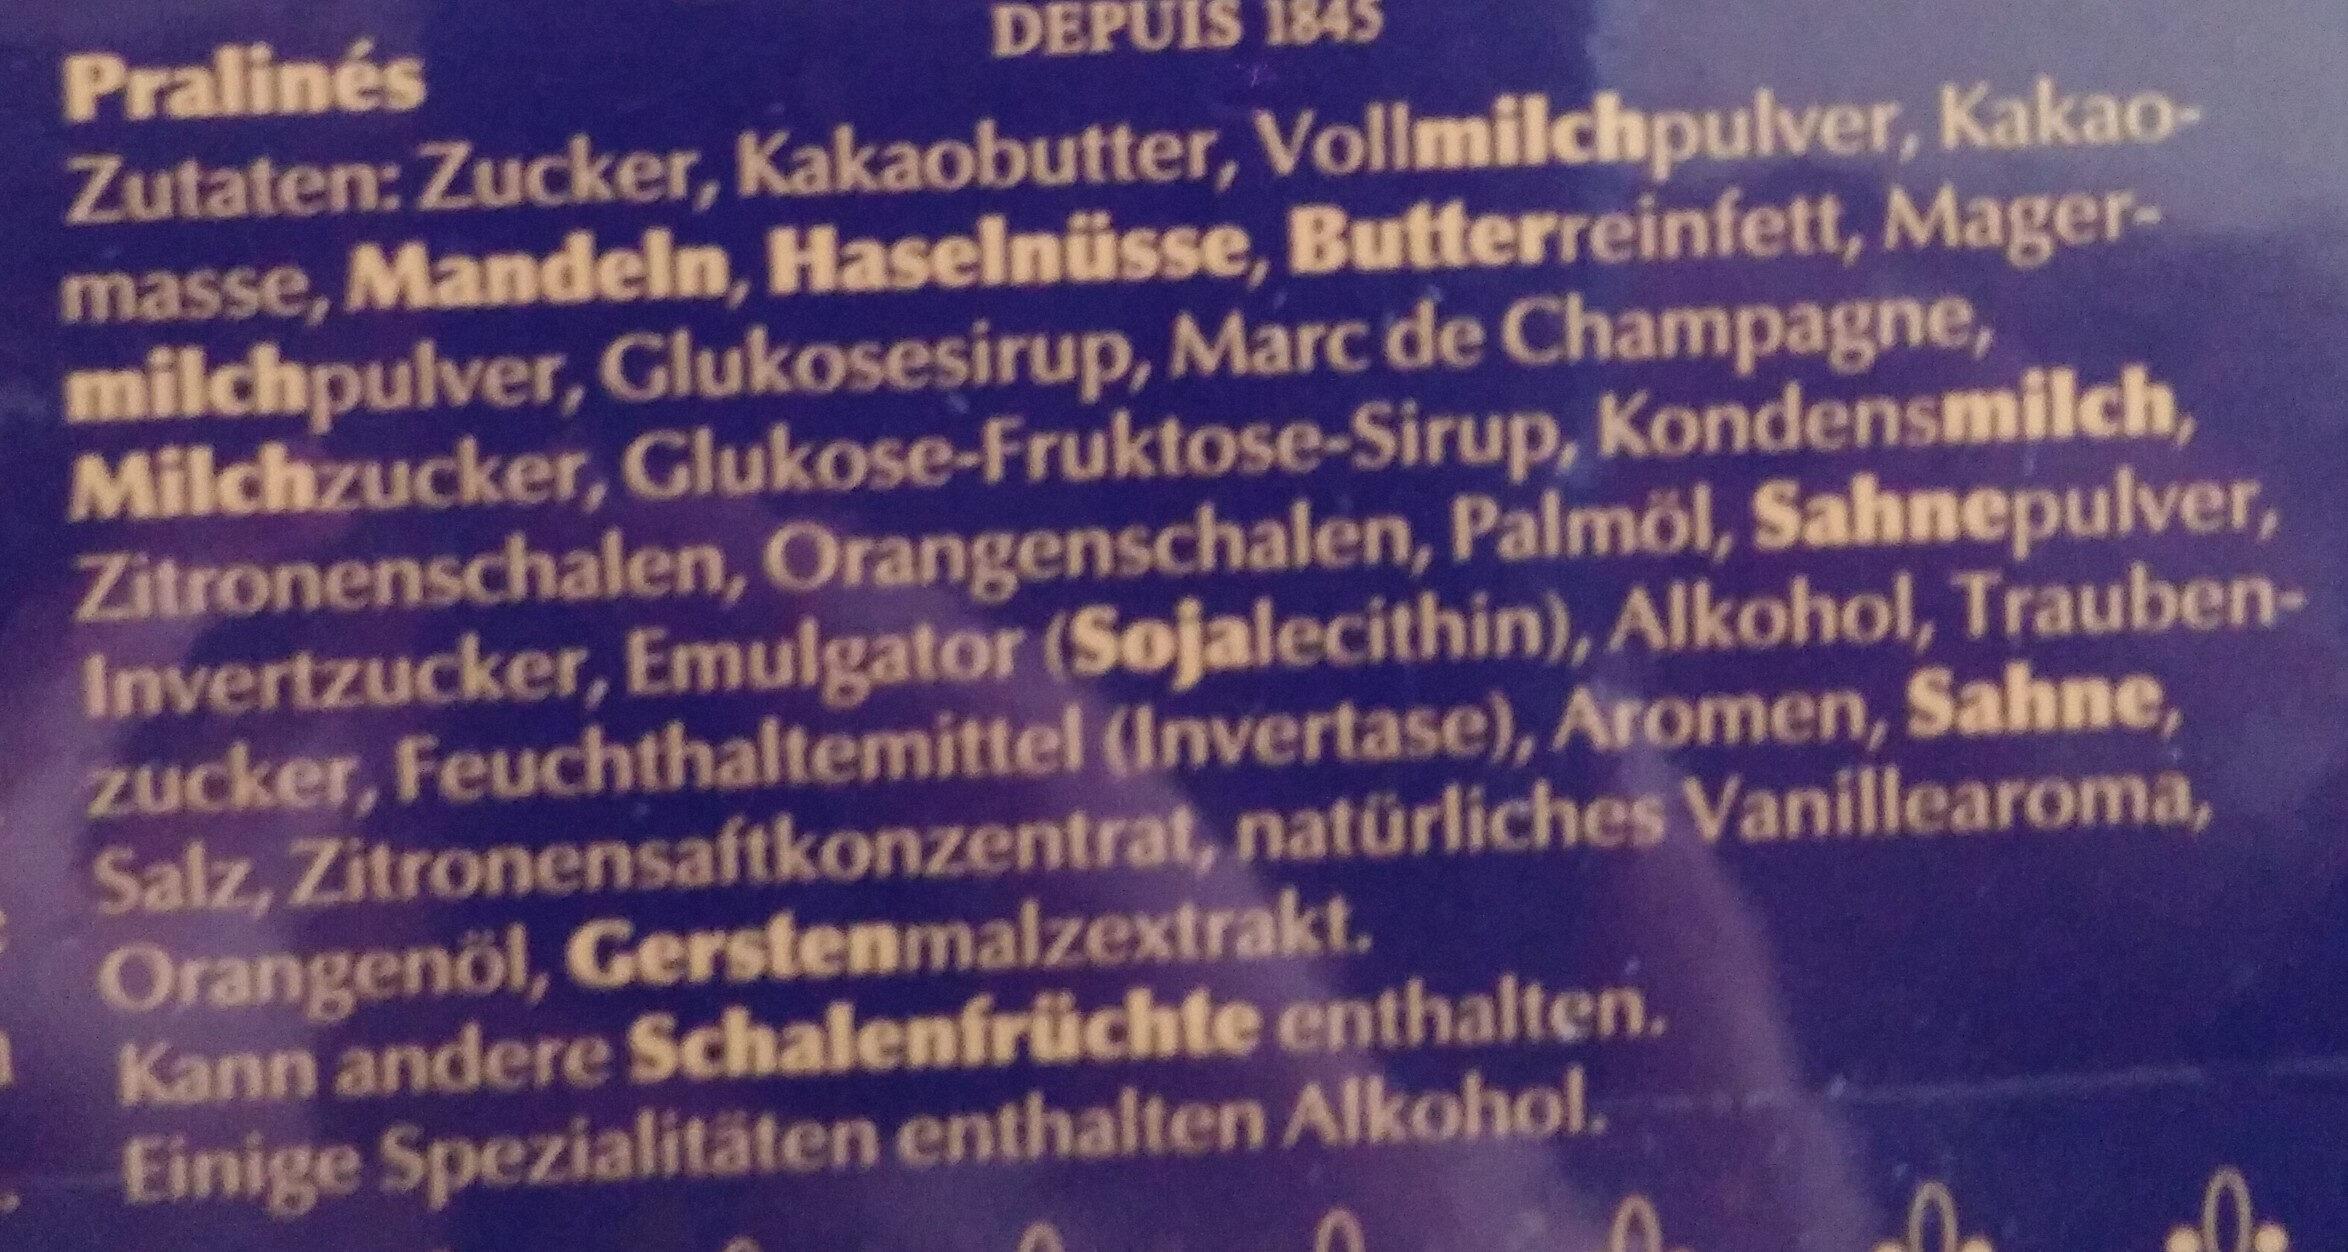 Pralinen - Ingredients